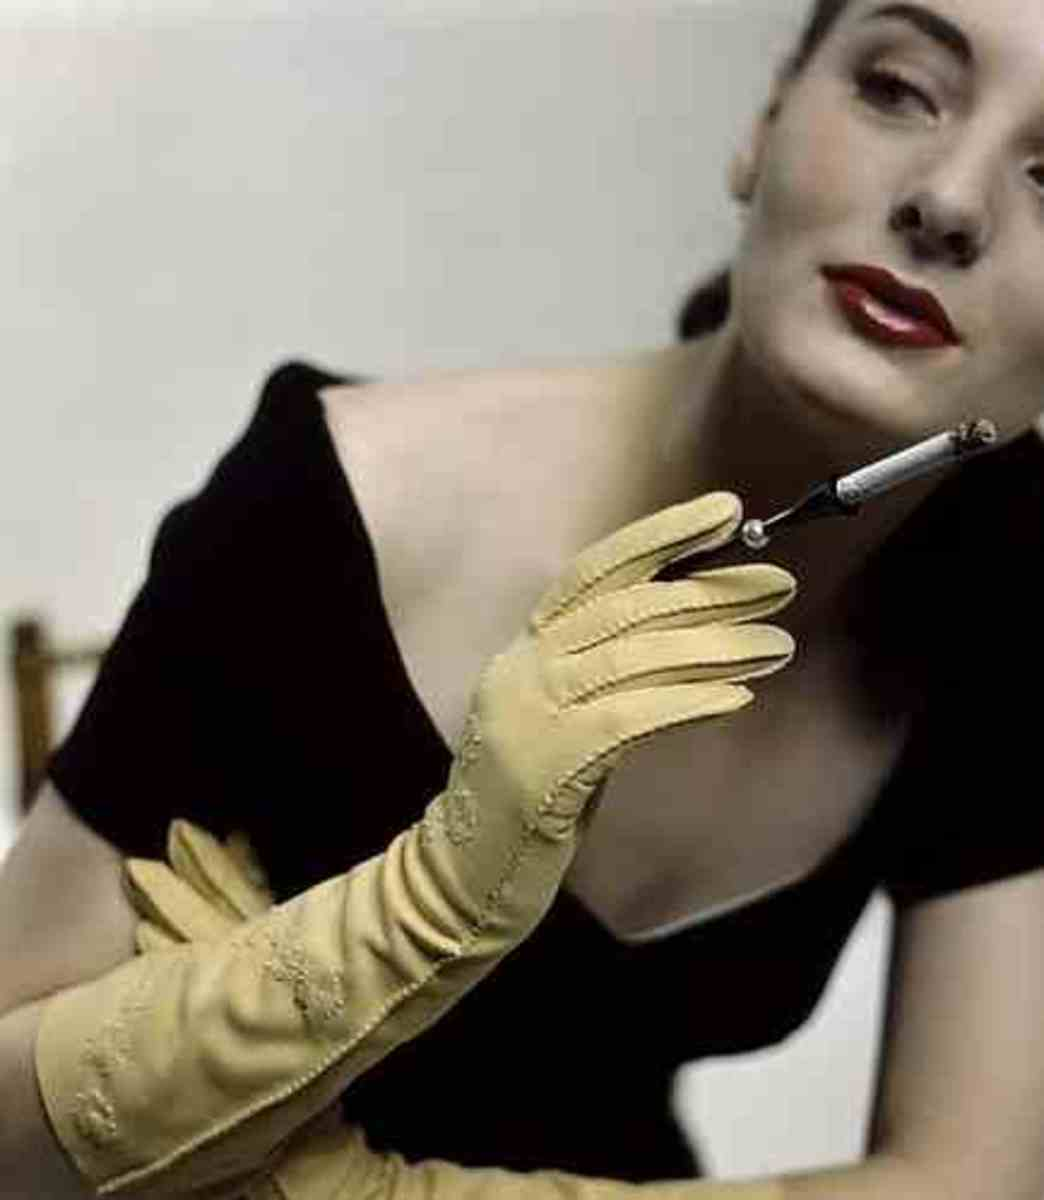 Femme Fatale gloves and cigarette holder favim.com